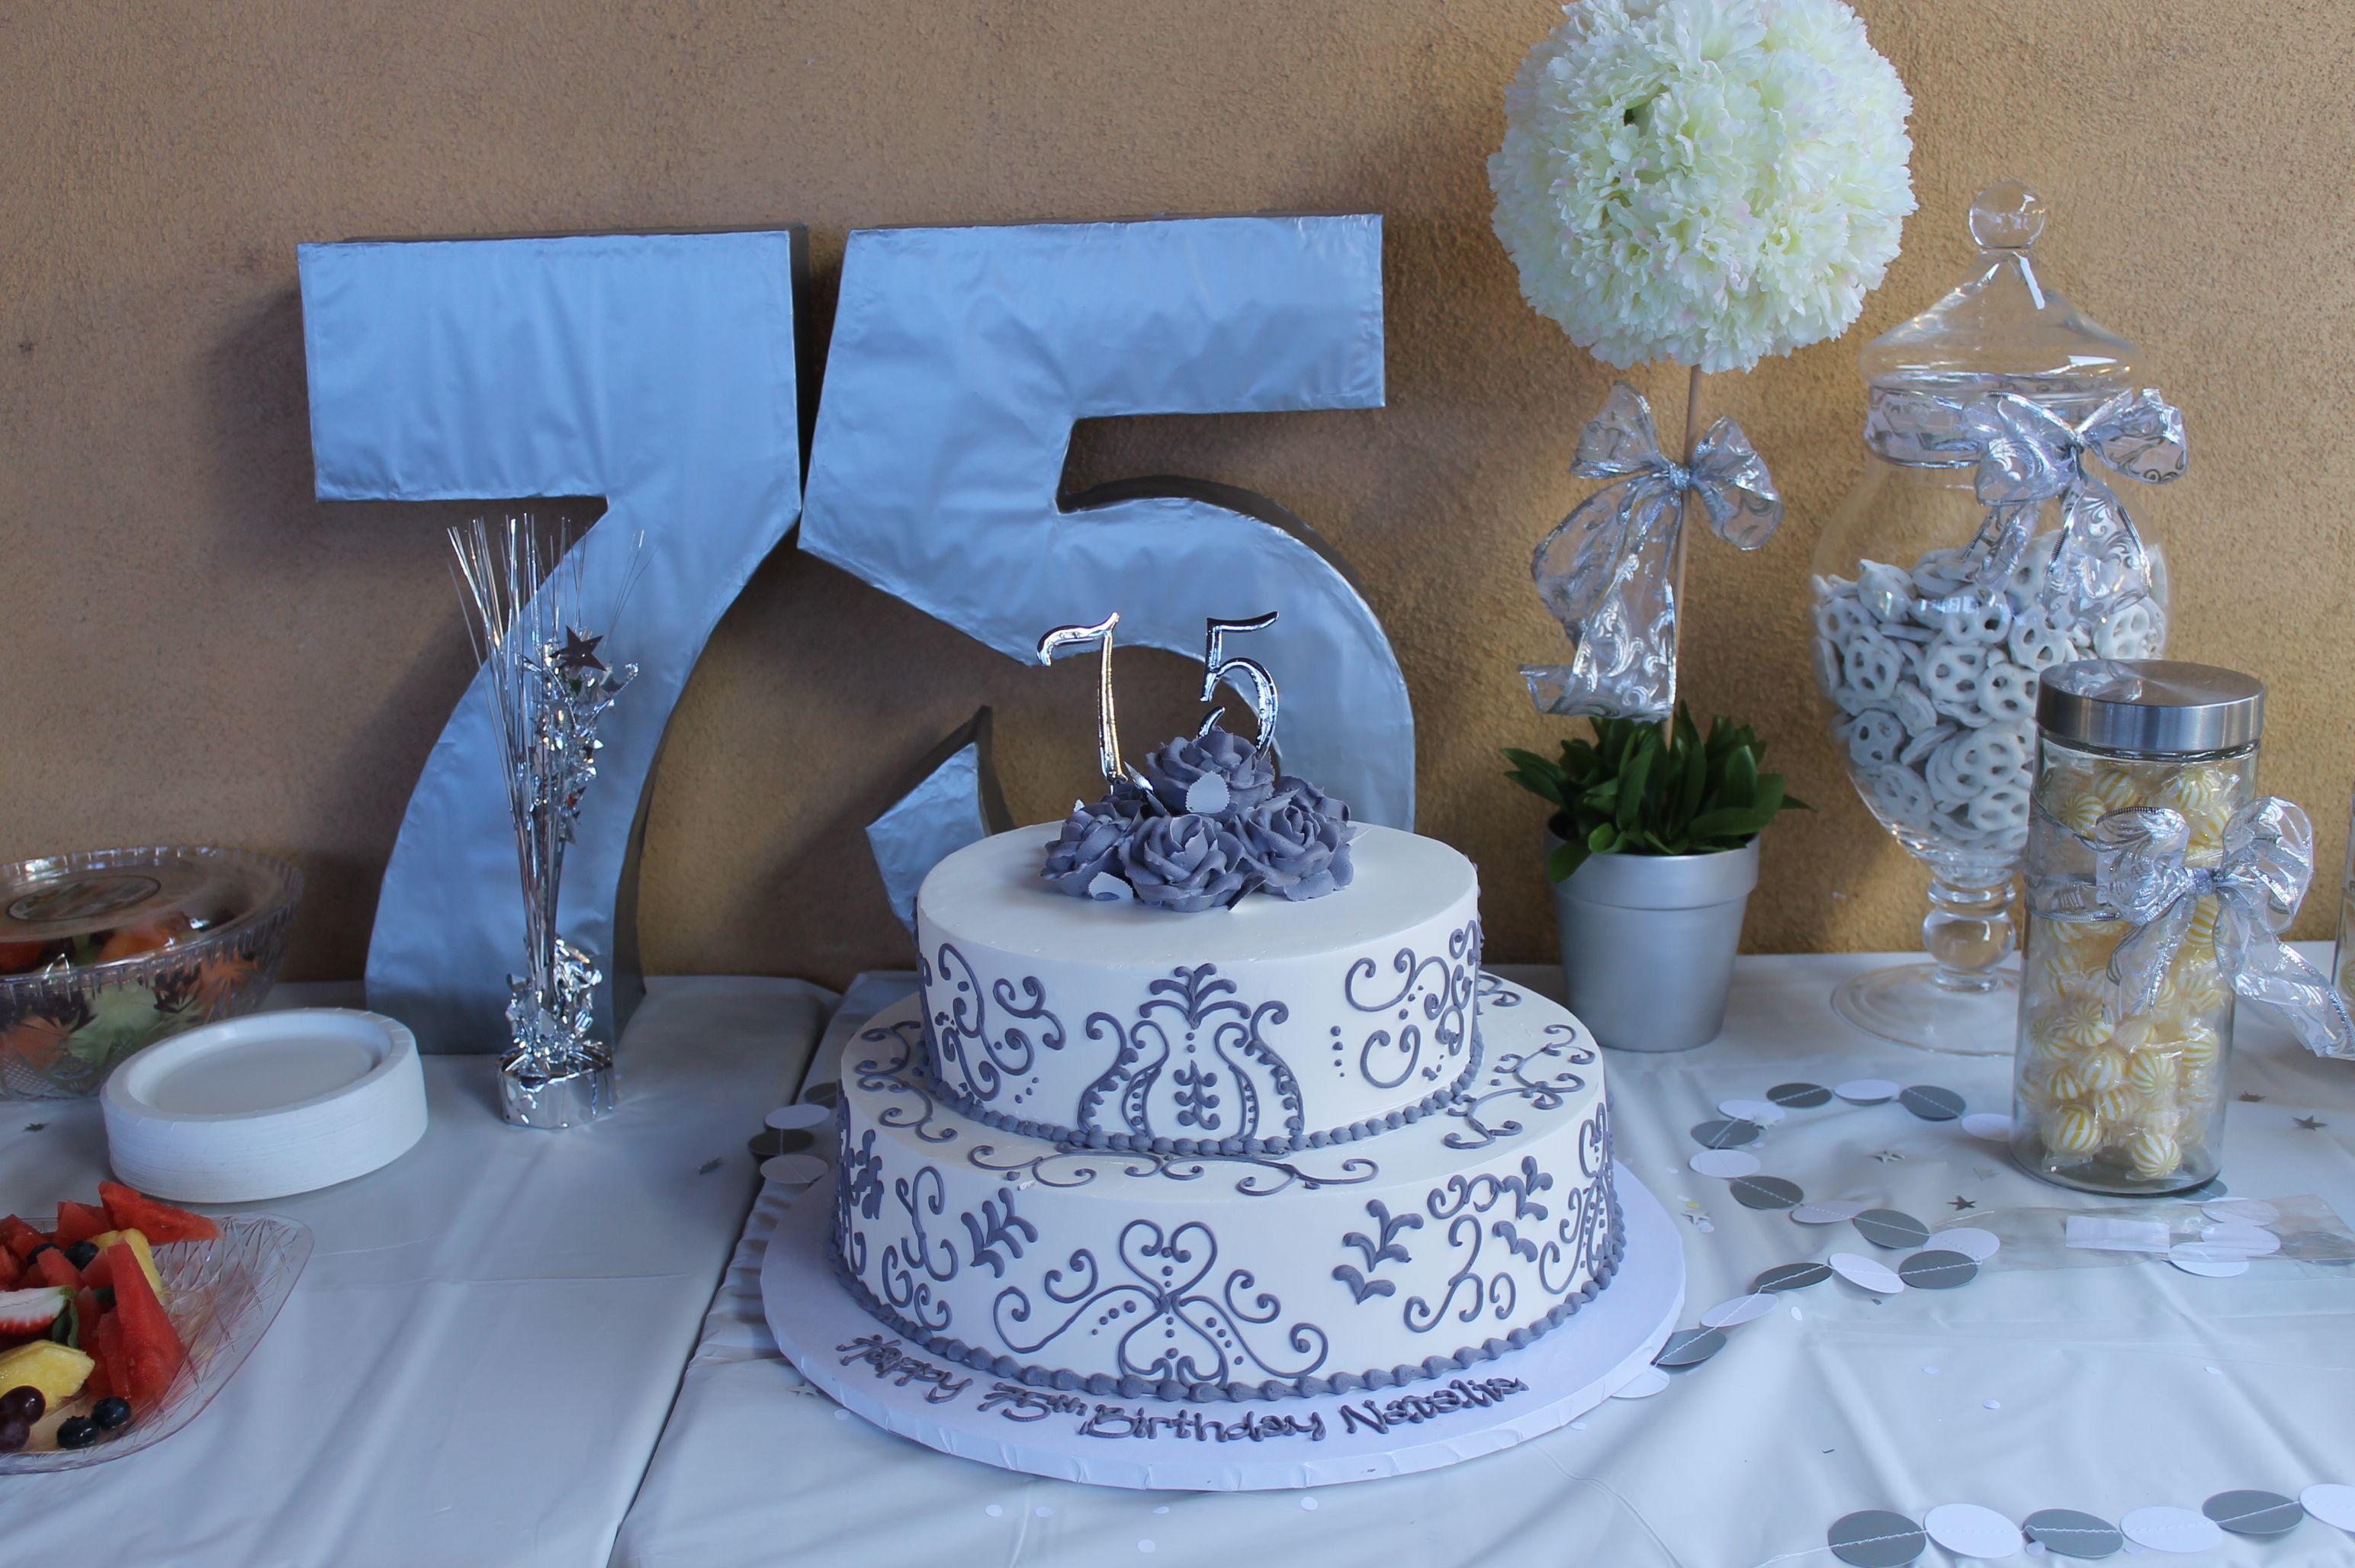 75th birthday party ideas 75th birthday decorations